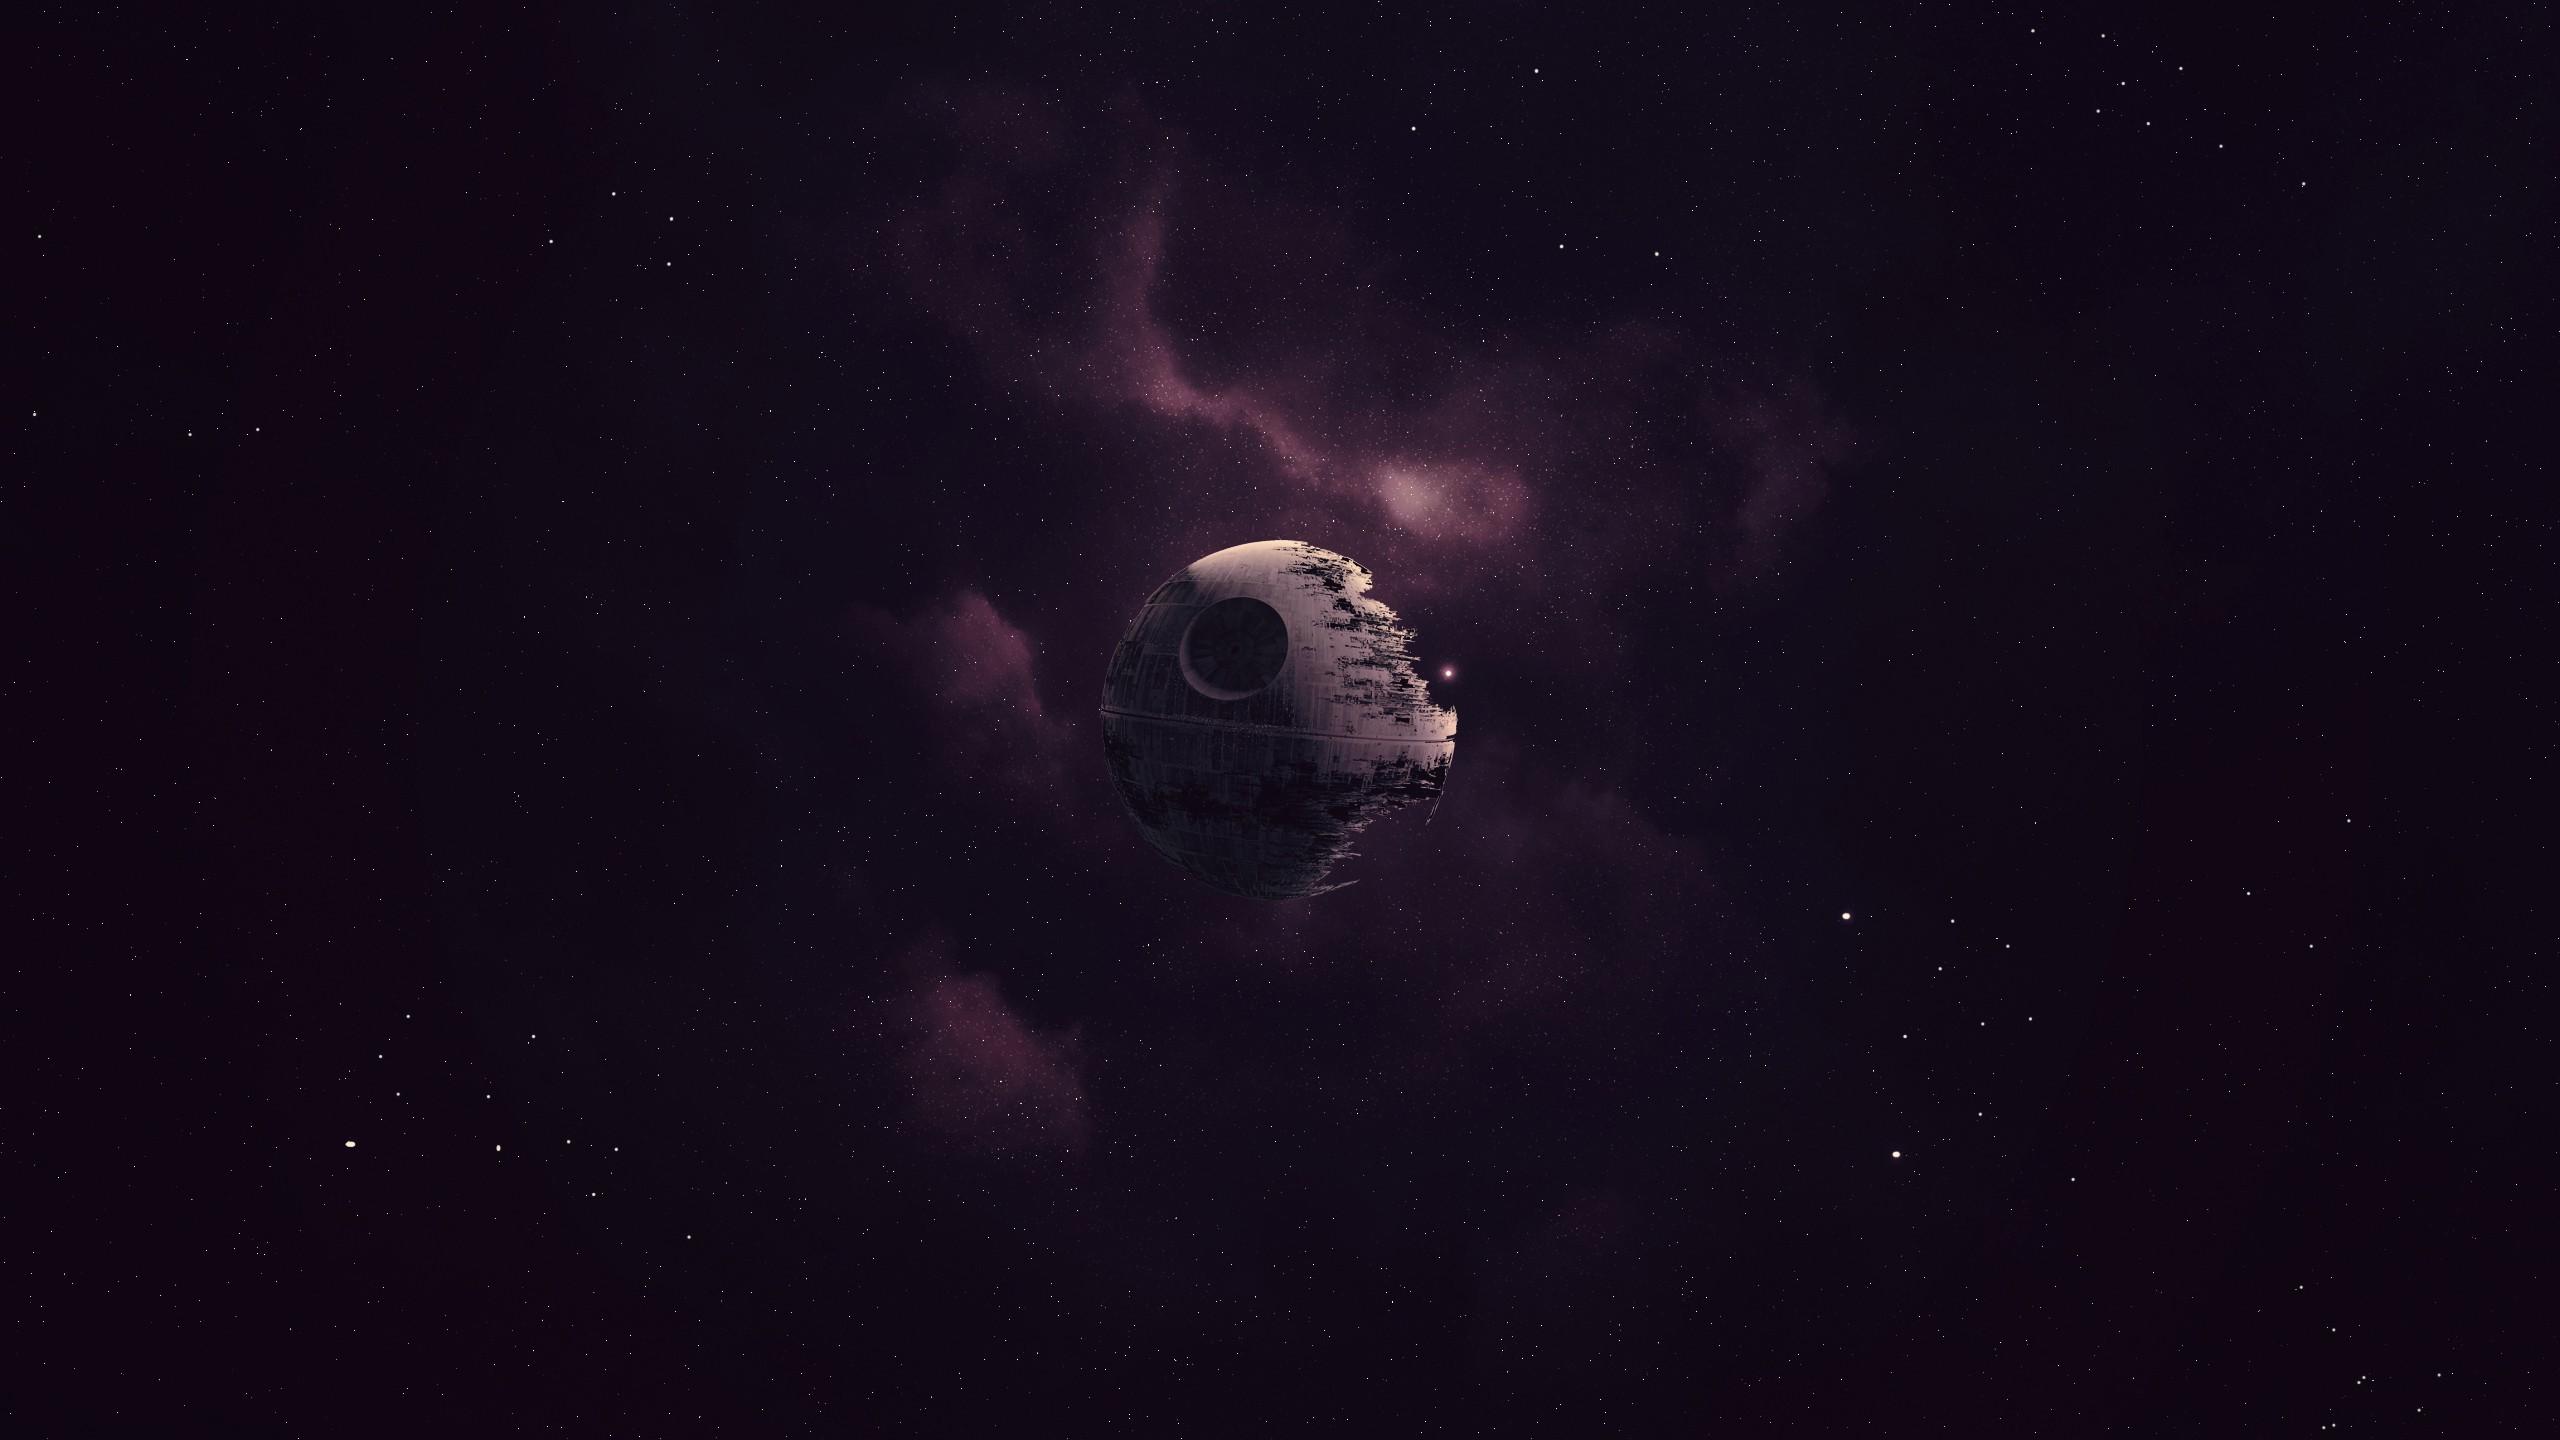 Star Wars, Death Star, Artwork, Space, Purple Wallpapers HD